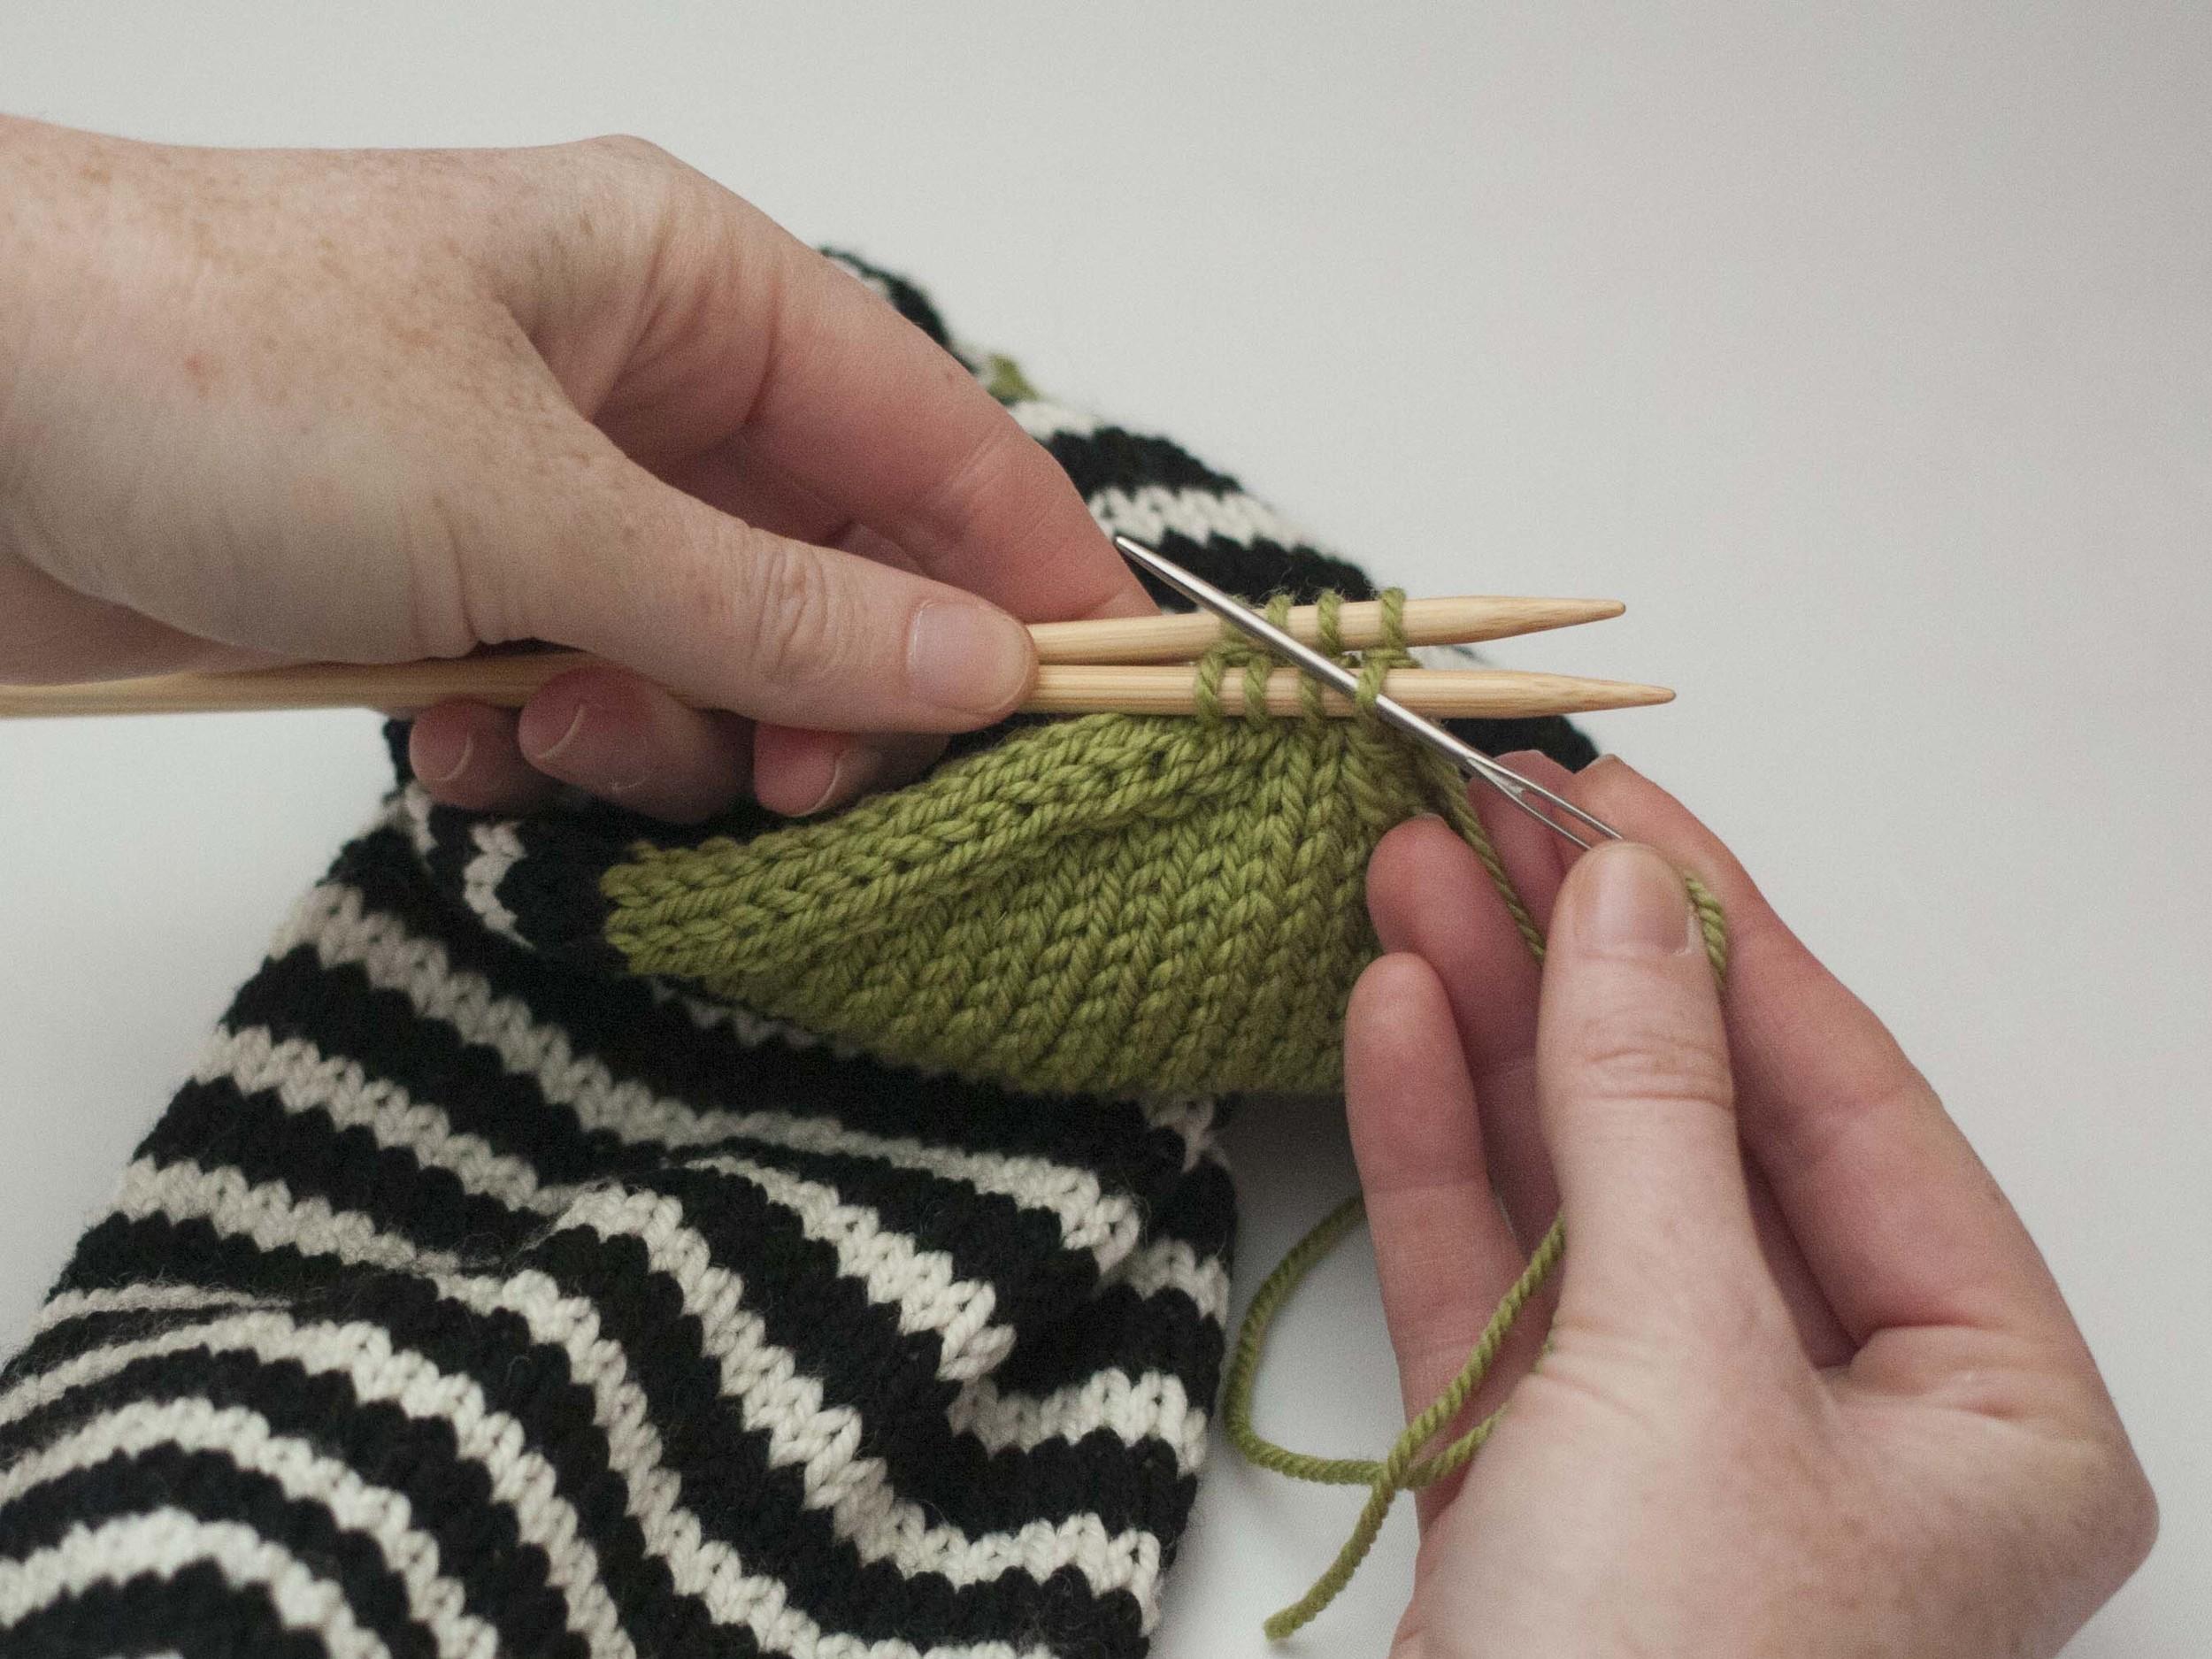 How to knit Kitchener Stitch